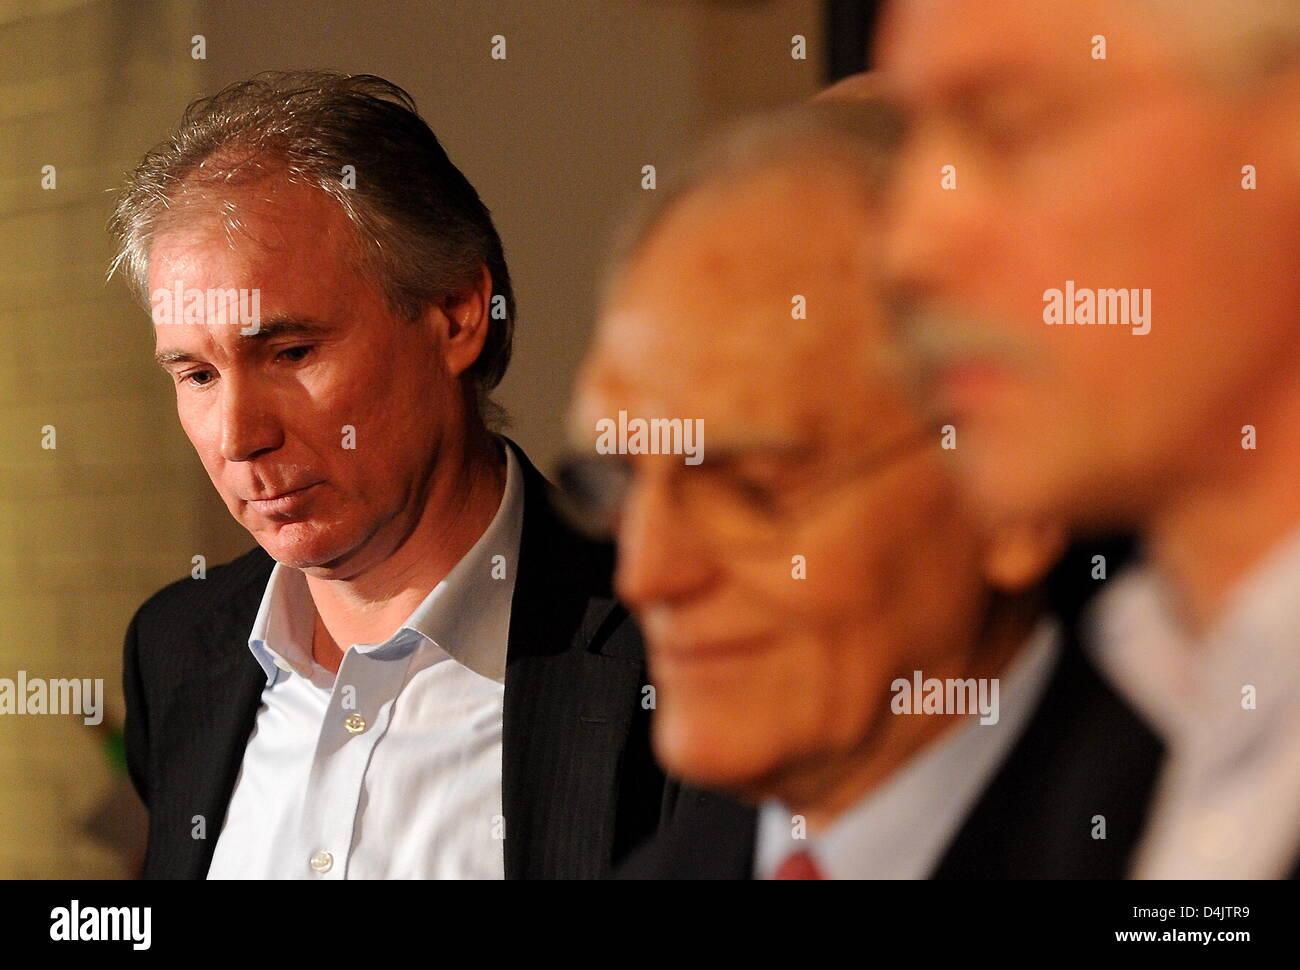 (L-R) Uwe Schwenker, managing director of German handball club THW Kiel, pictured during a crisis meeting of Handball - Stock Image